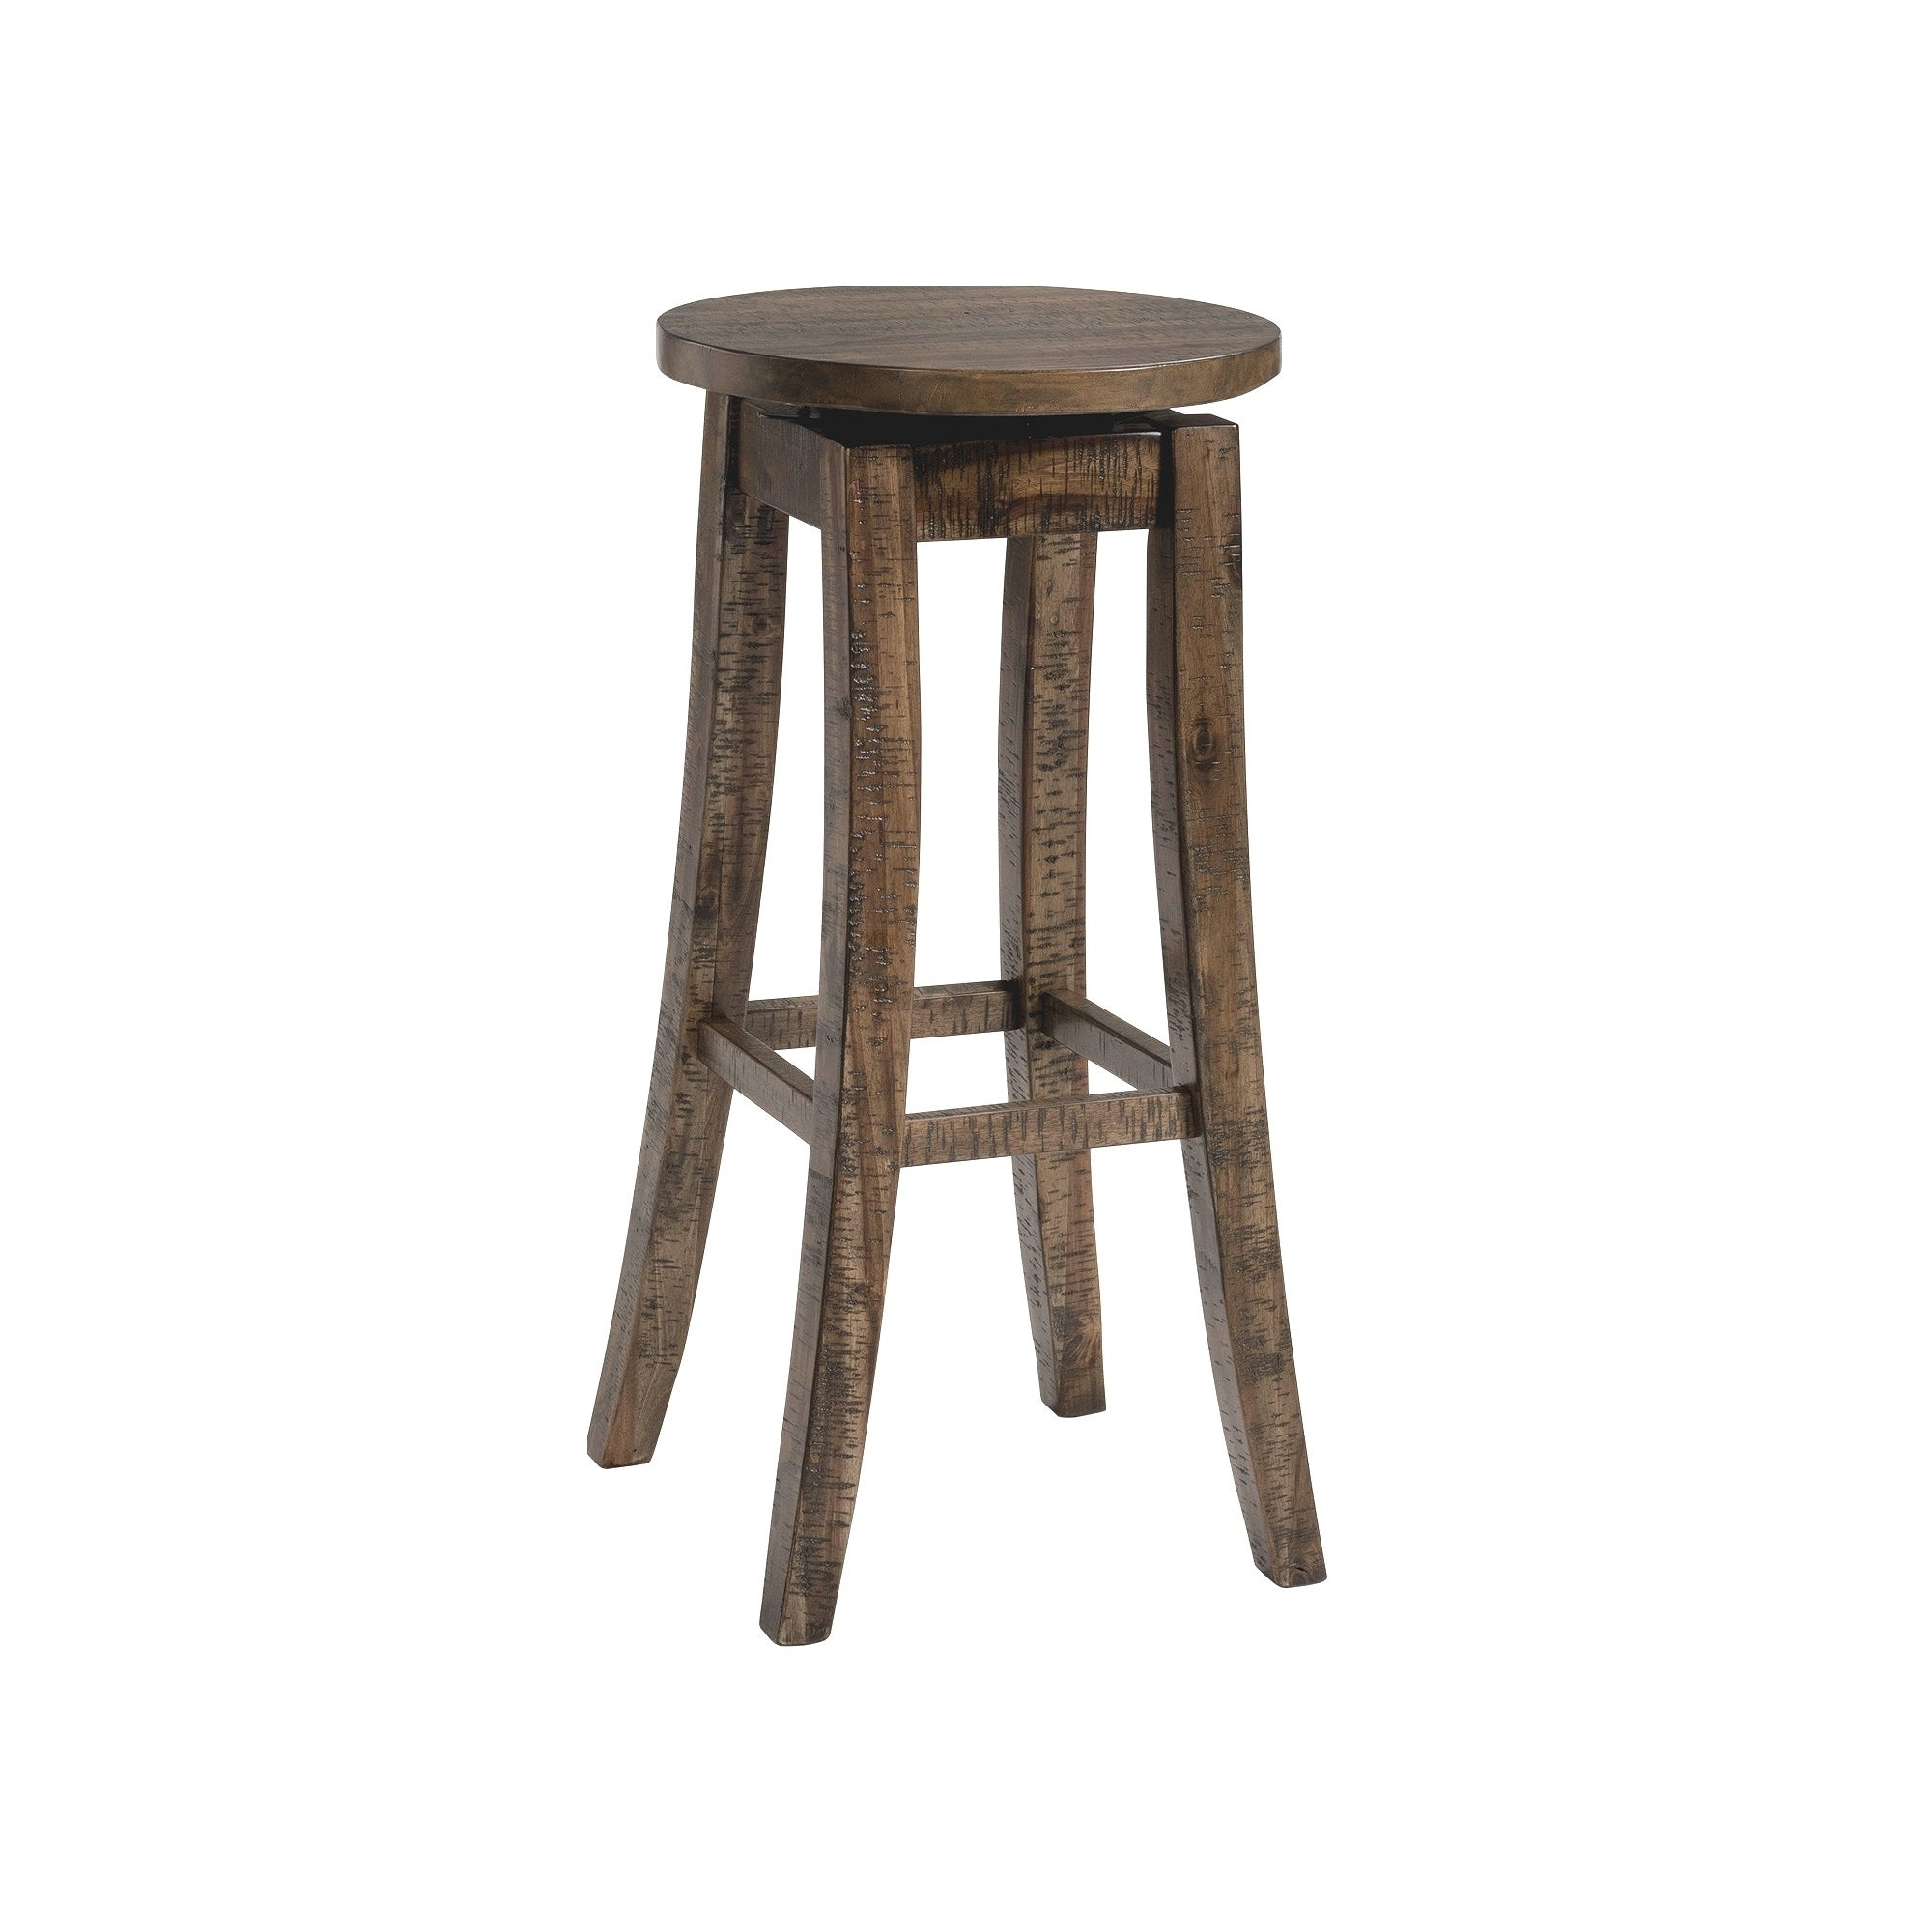 Picket House Furnishings Flynn Walnut Finush Wood 30 Inch Swivel Backless Bar Stool Set Of 2